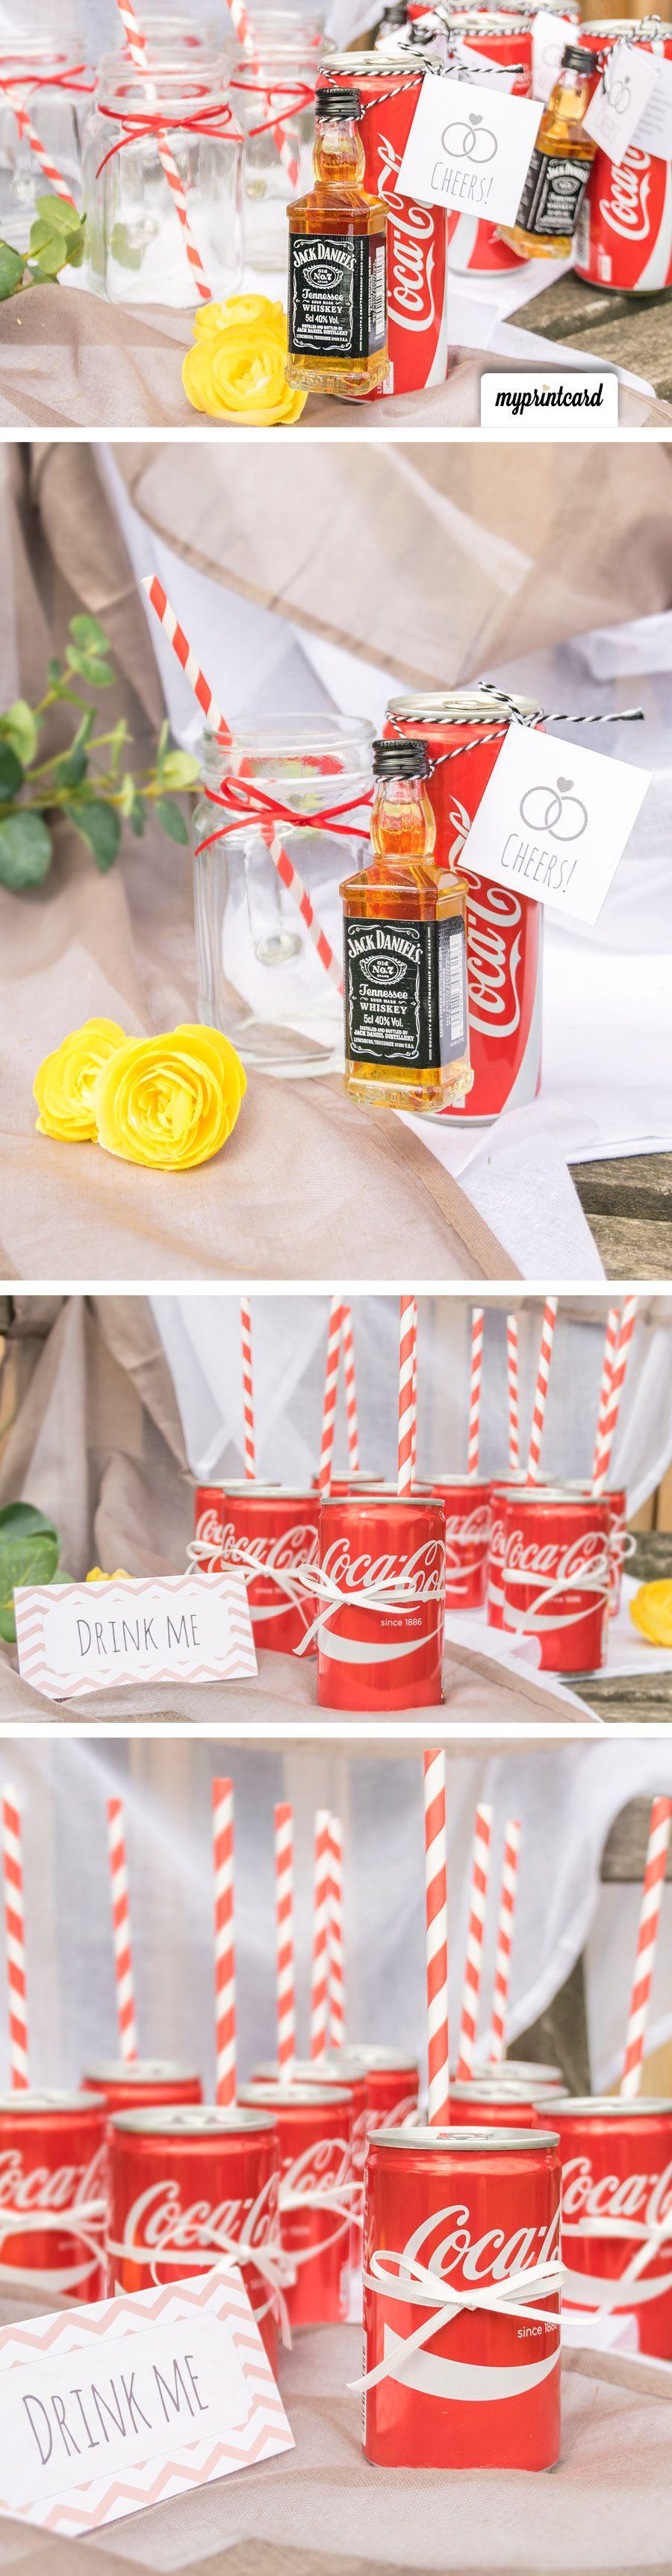 Ideen Fur Den Sektempfang Bei Der Hochzeit Hochzeit Trends